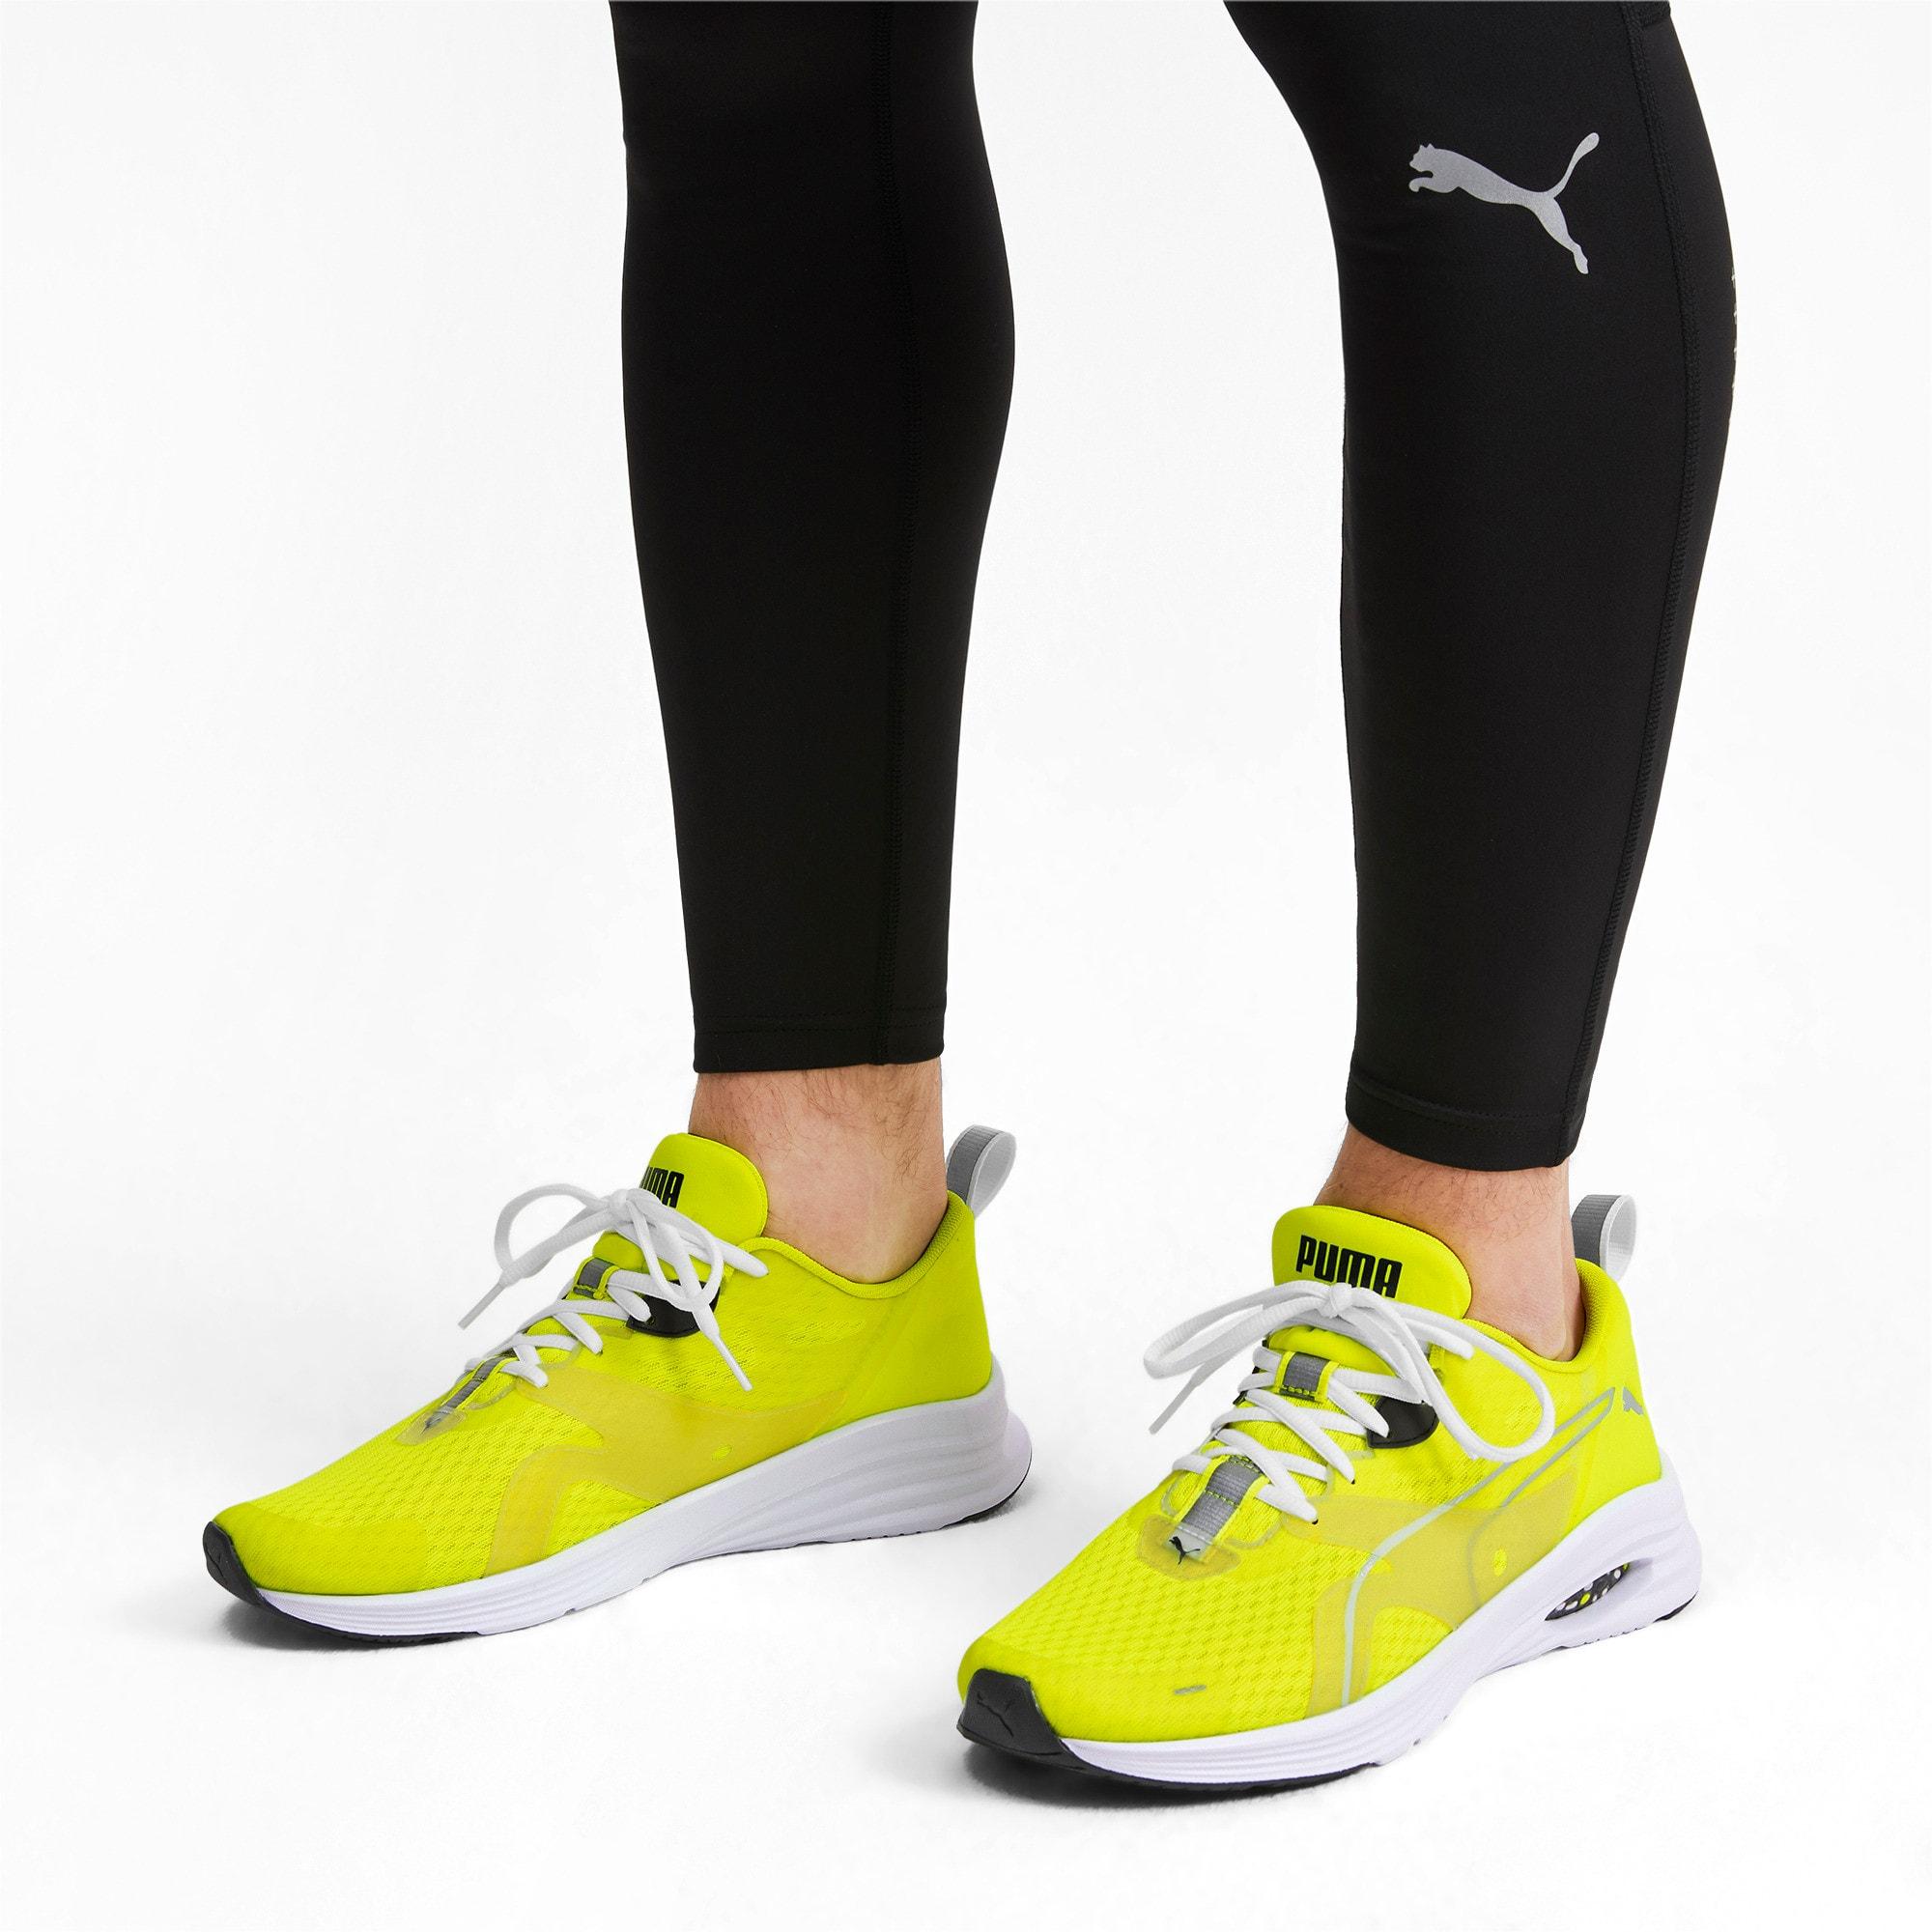 Thumbnail 3 of HYBRID Fuego Lights Men's Running Shoes, Yellow Alert, medium